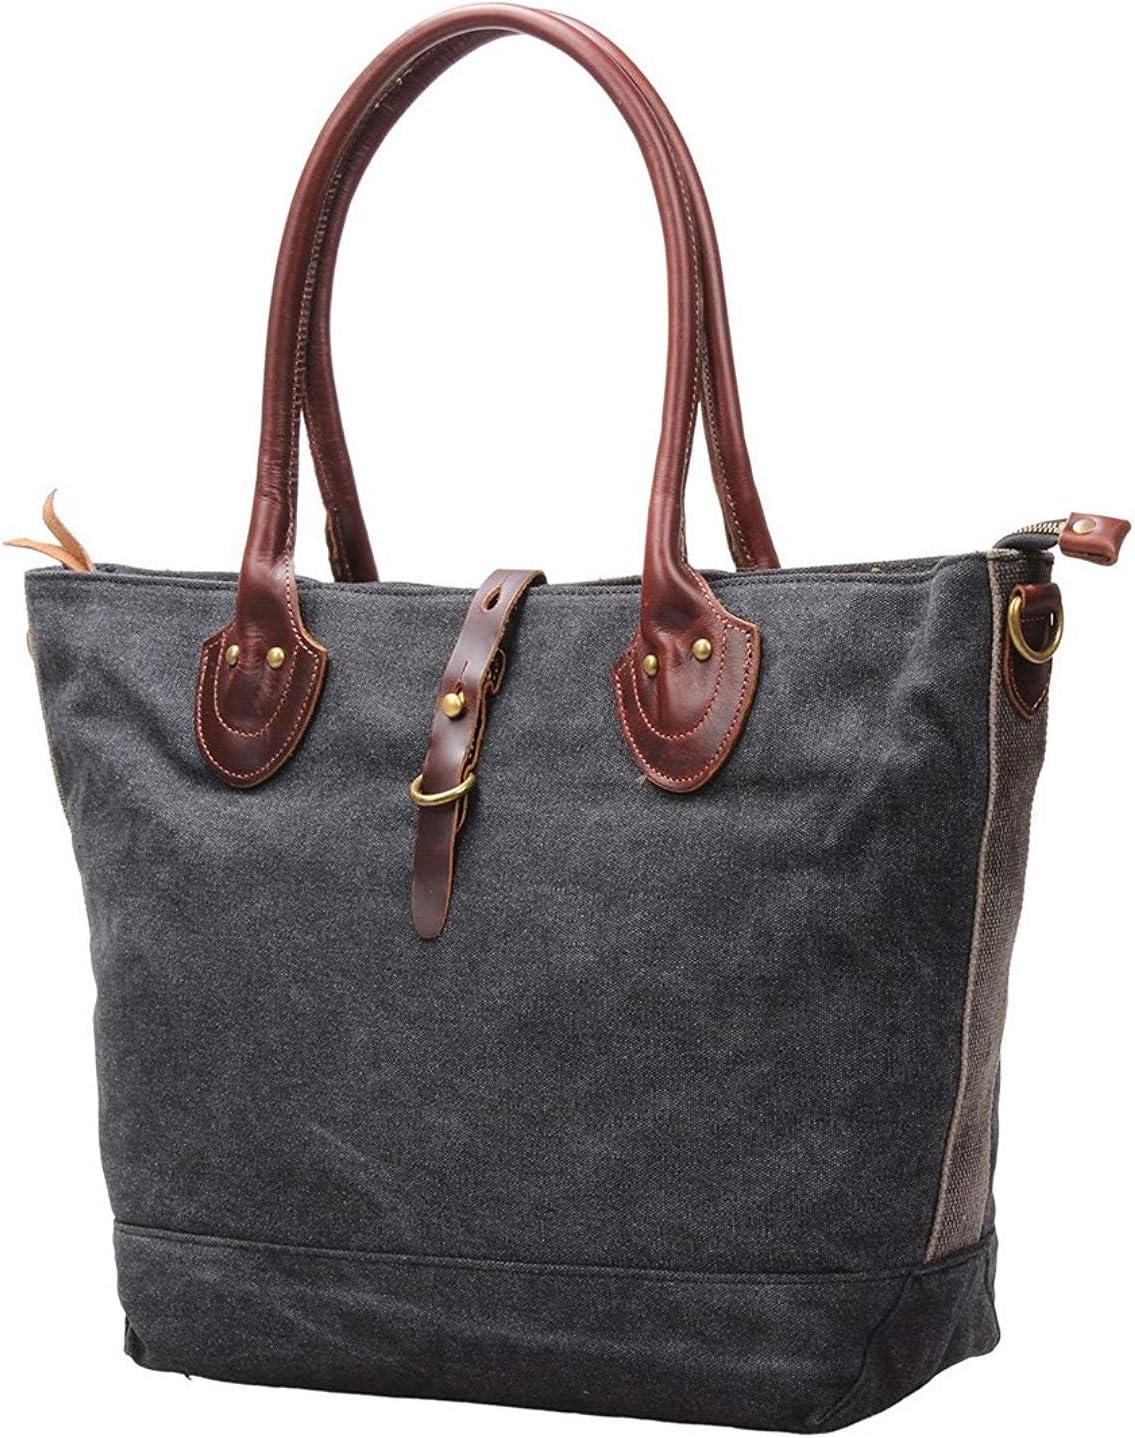 Womens Vintage Canvas Hobo Tote Handbag Leather Shoulder Bags Large M65 (045 grey)